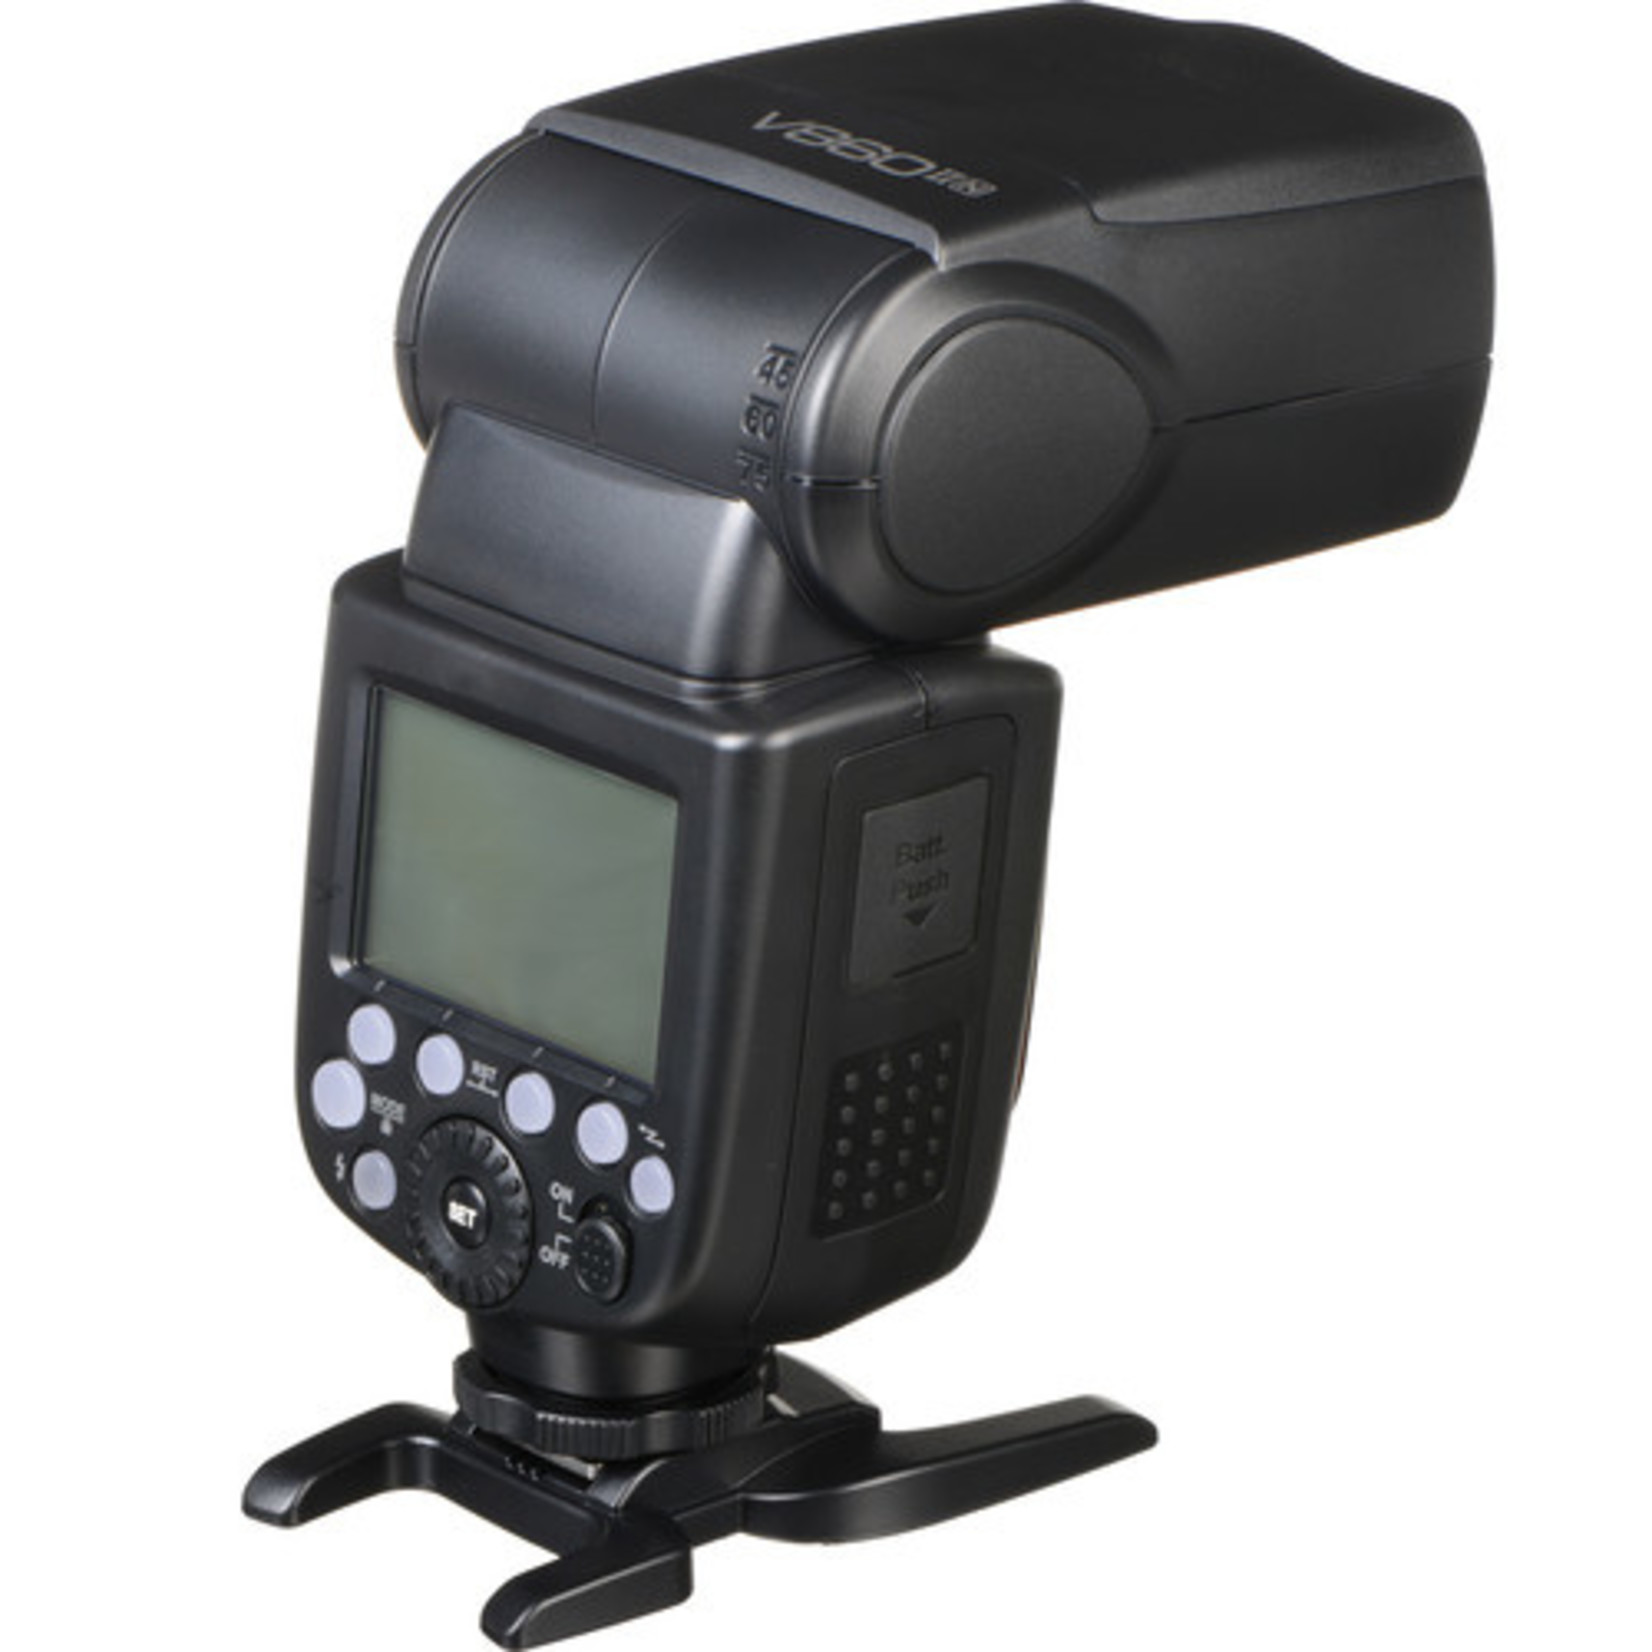 Godox GodoxVING V860 II Li-Ion Flash for Nikon